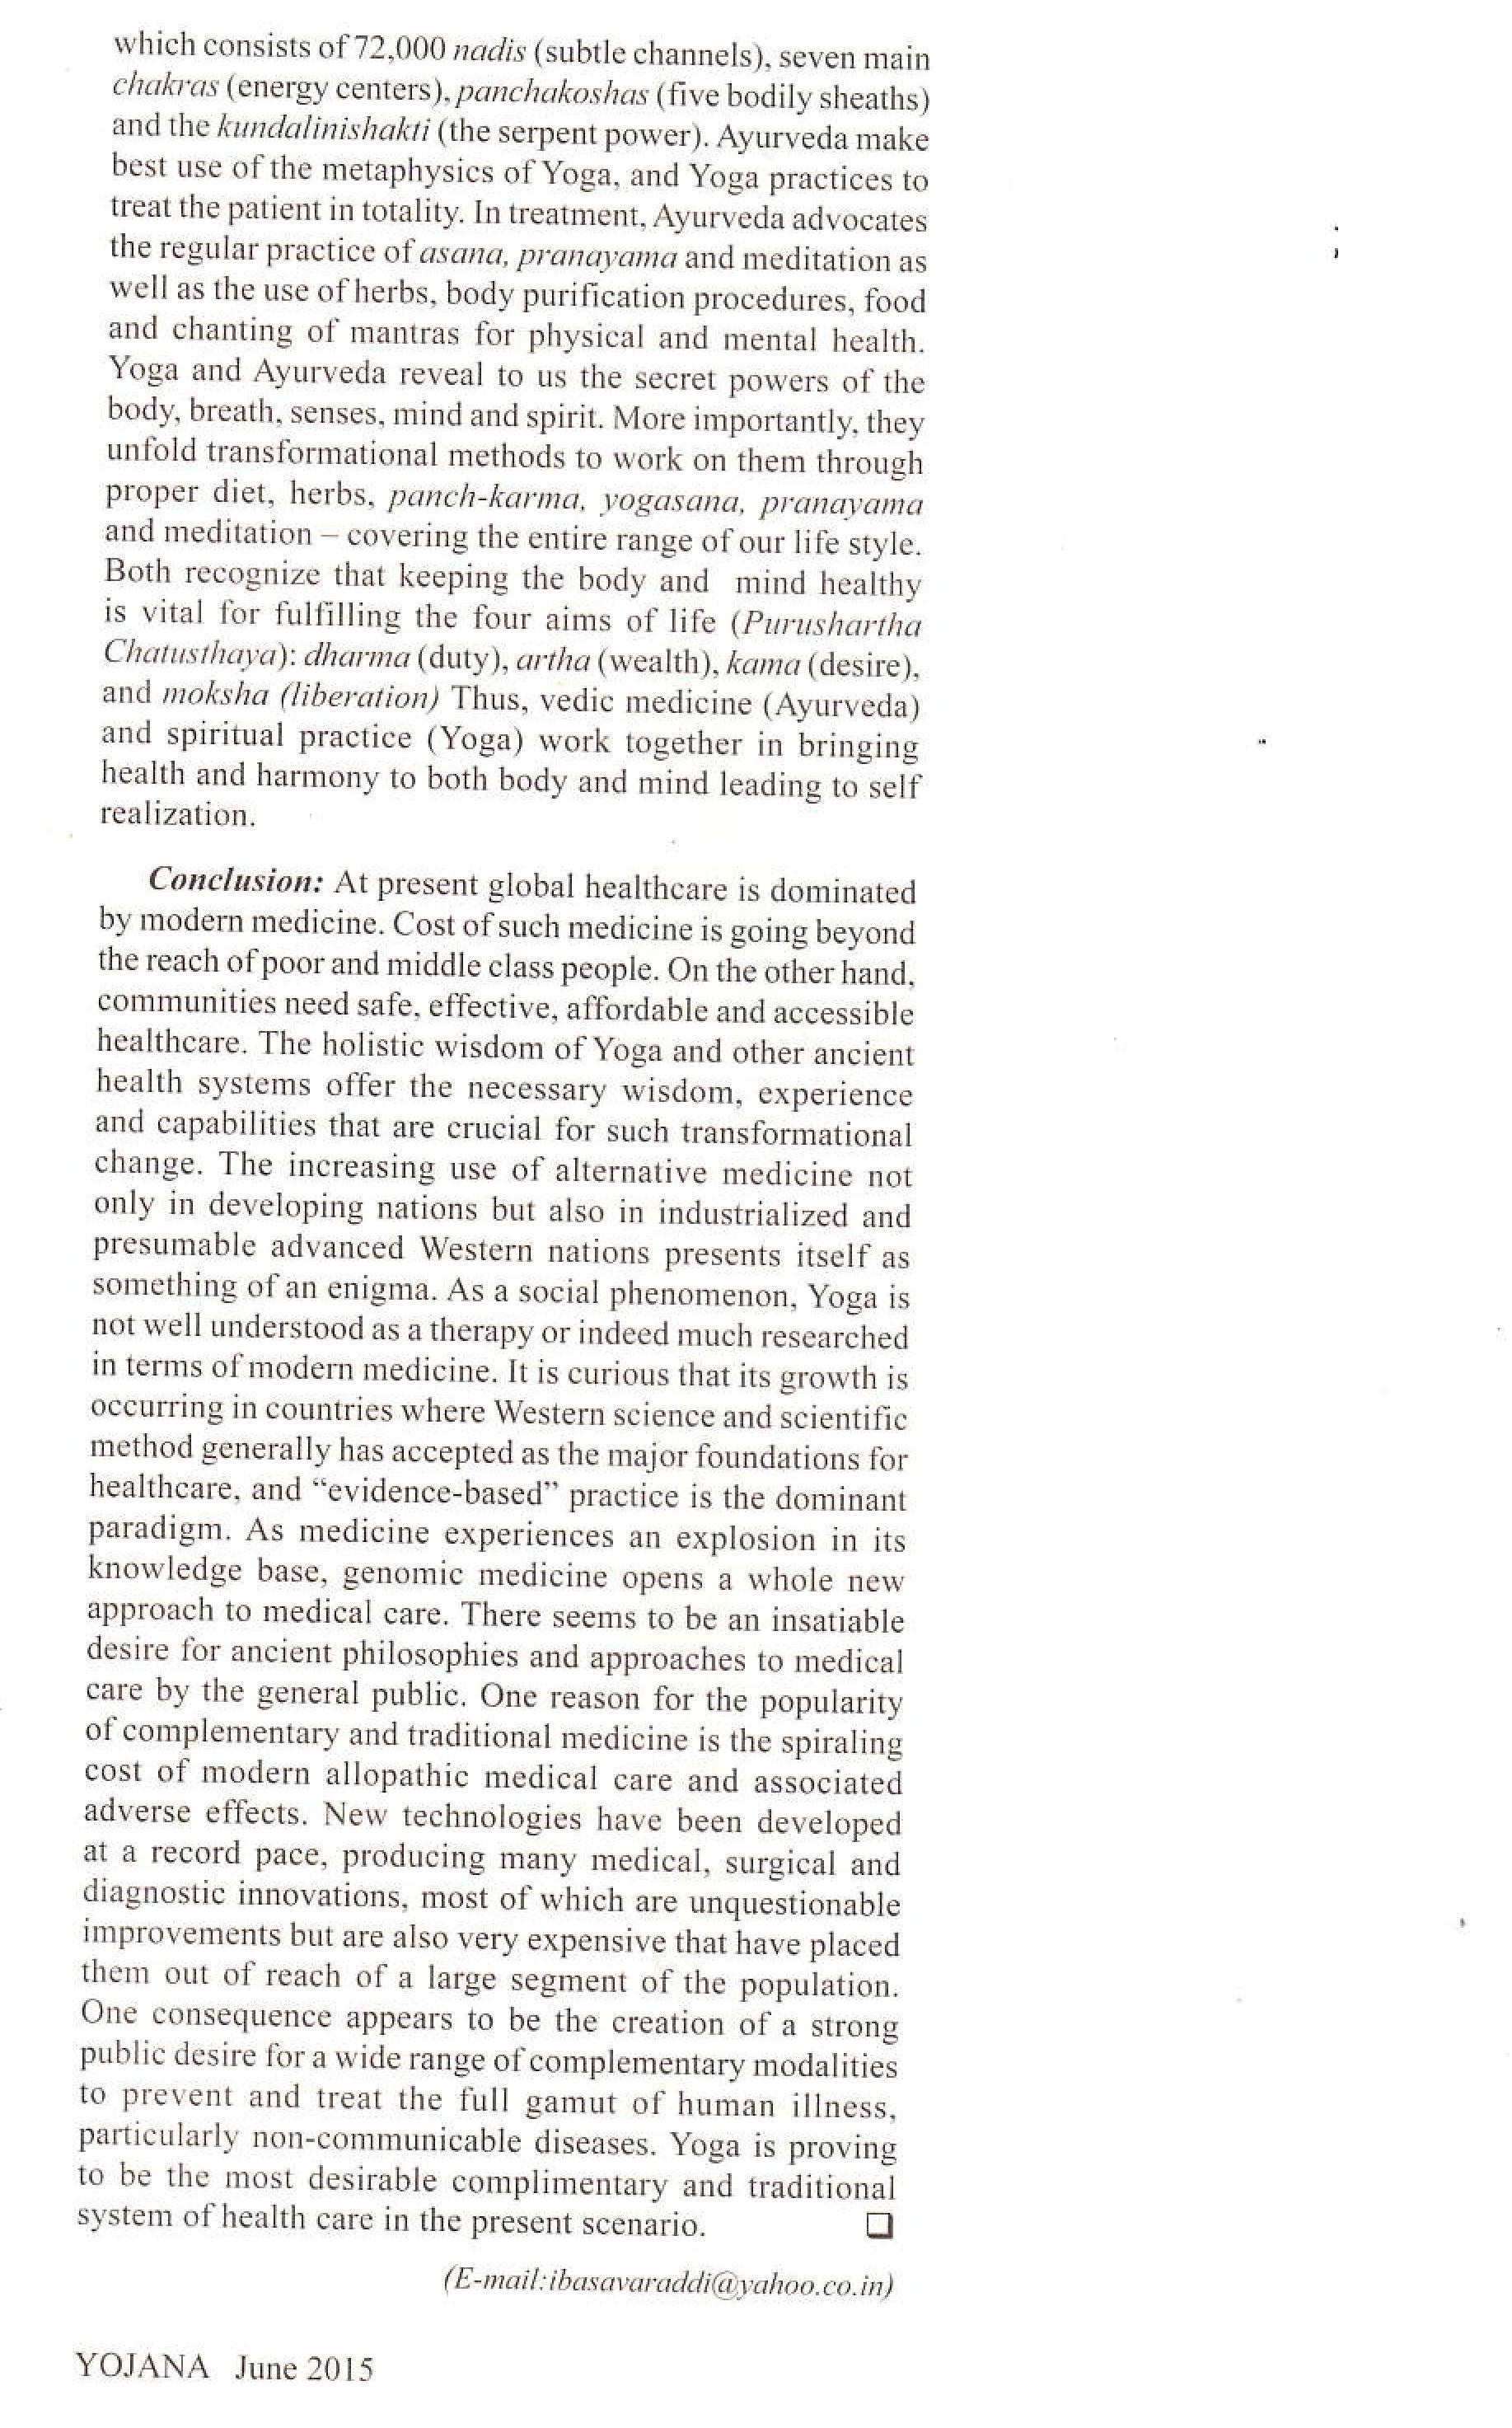 yojana june 2015 Yojana magazine january 2015- june 2015 pdf download october 8, 2015 xaam org share this on whatsapp january february march april may june : source: new feed.